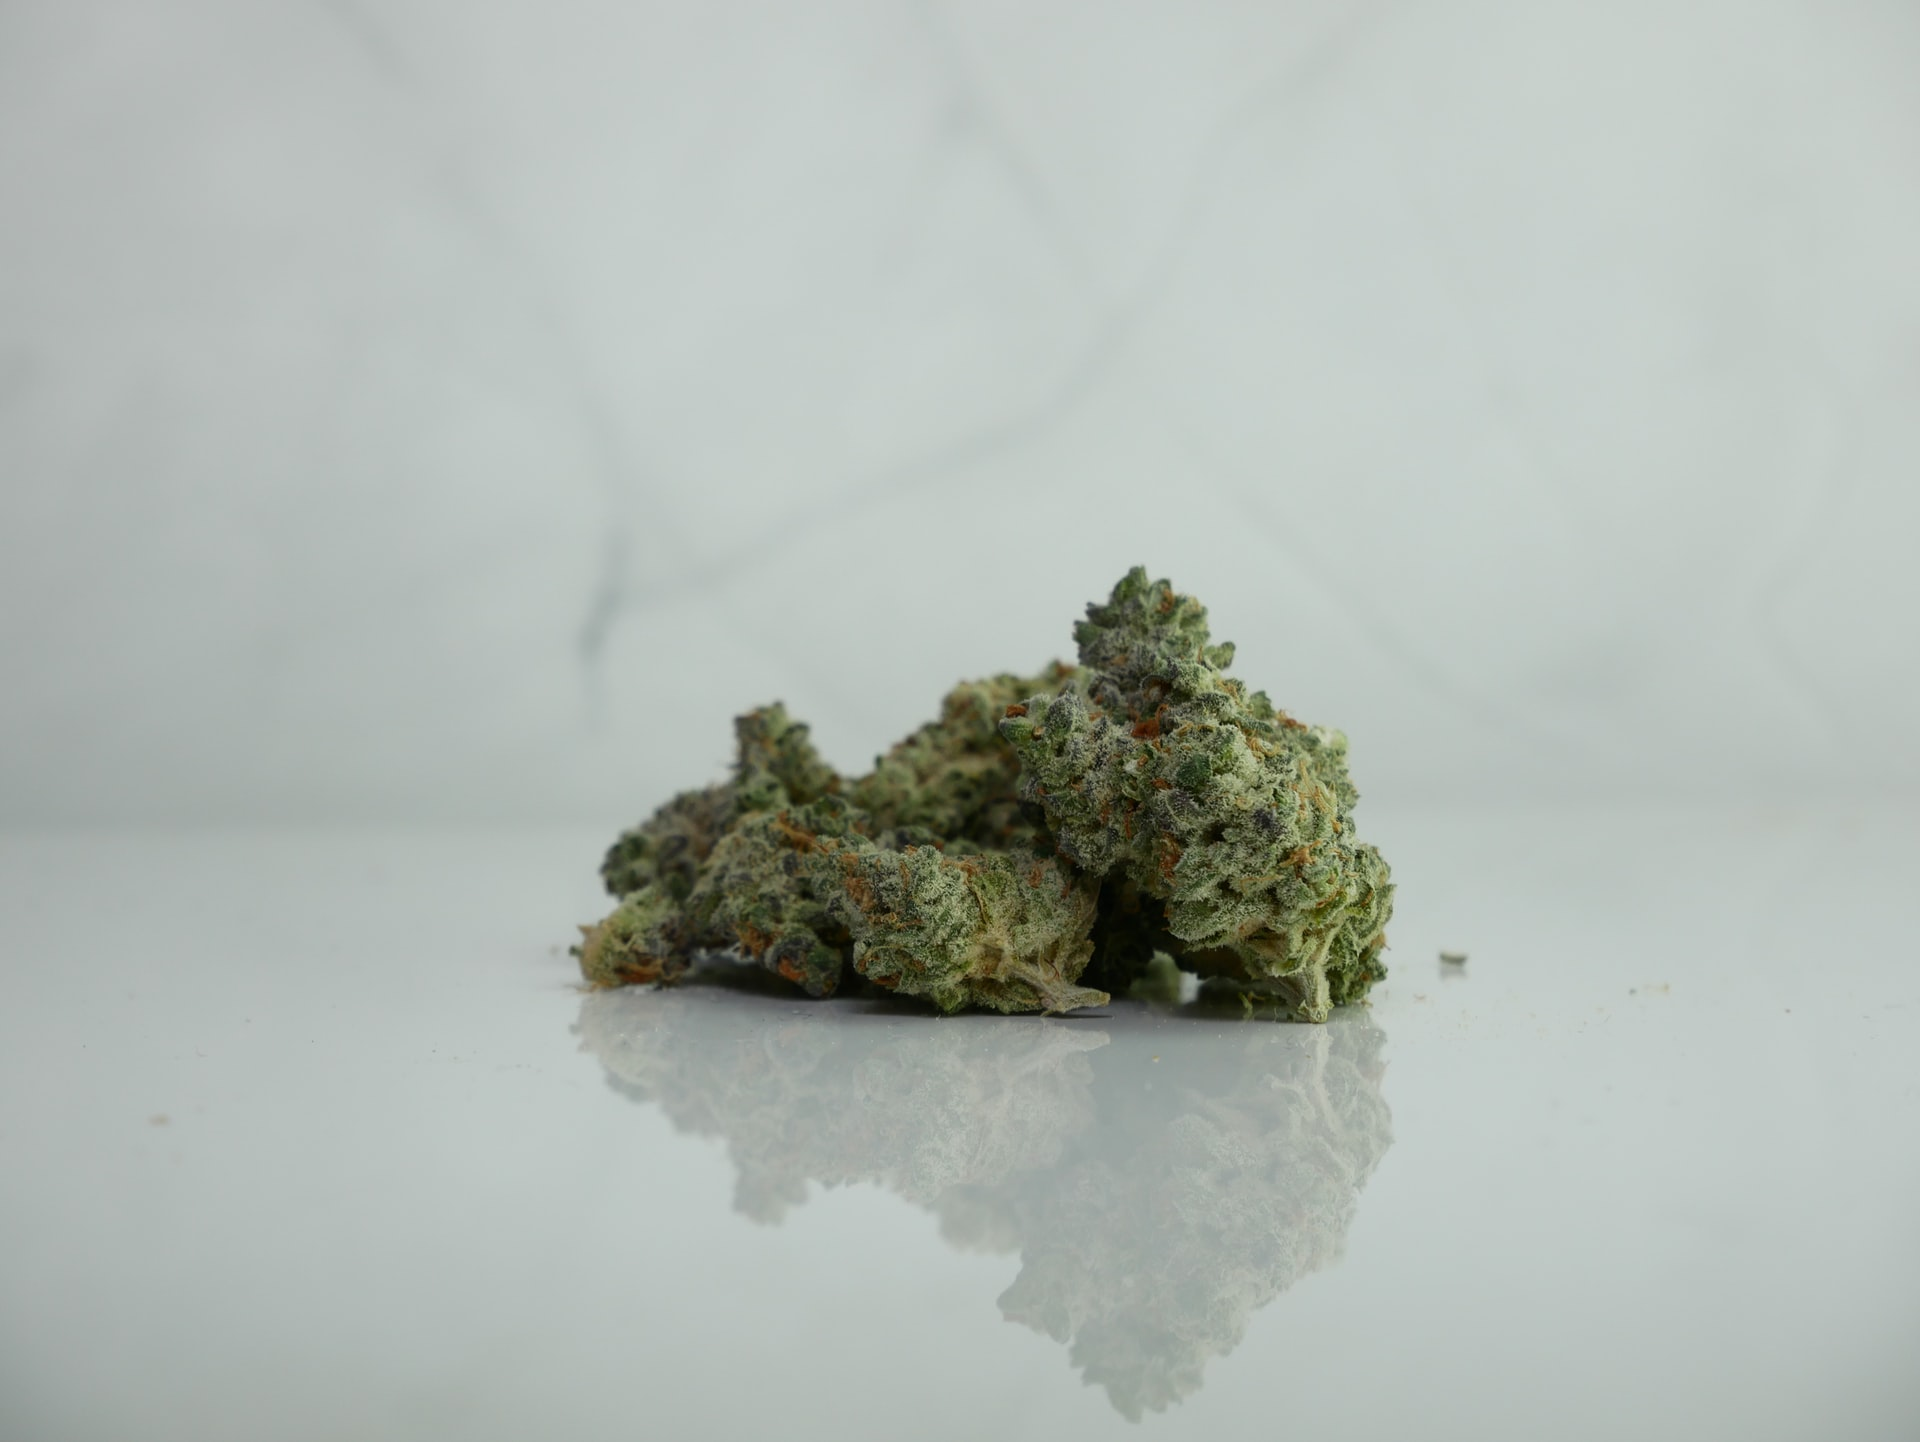 marijuana buds on white surface